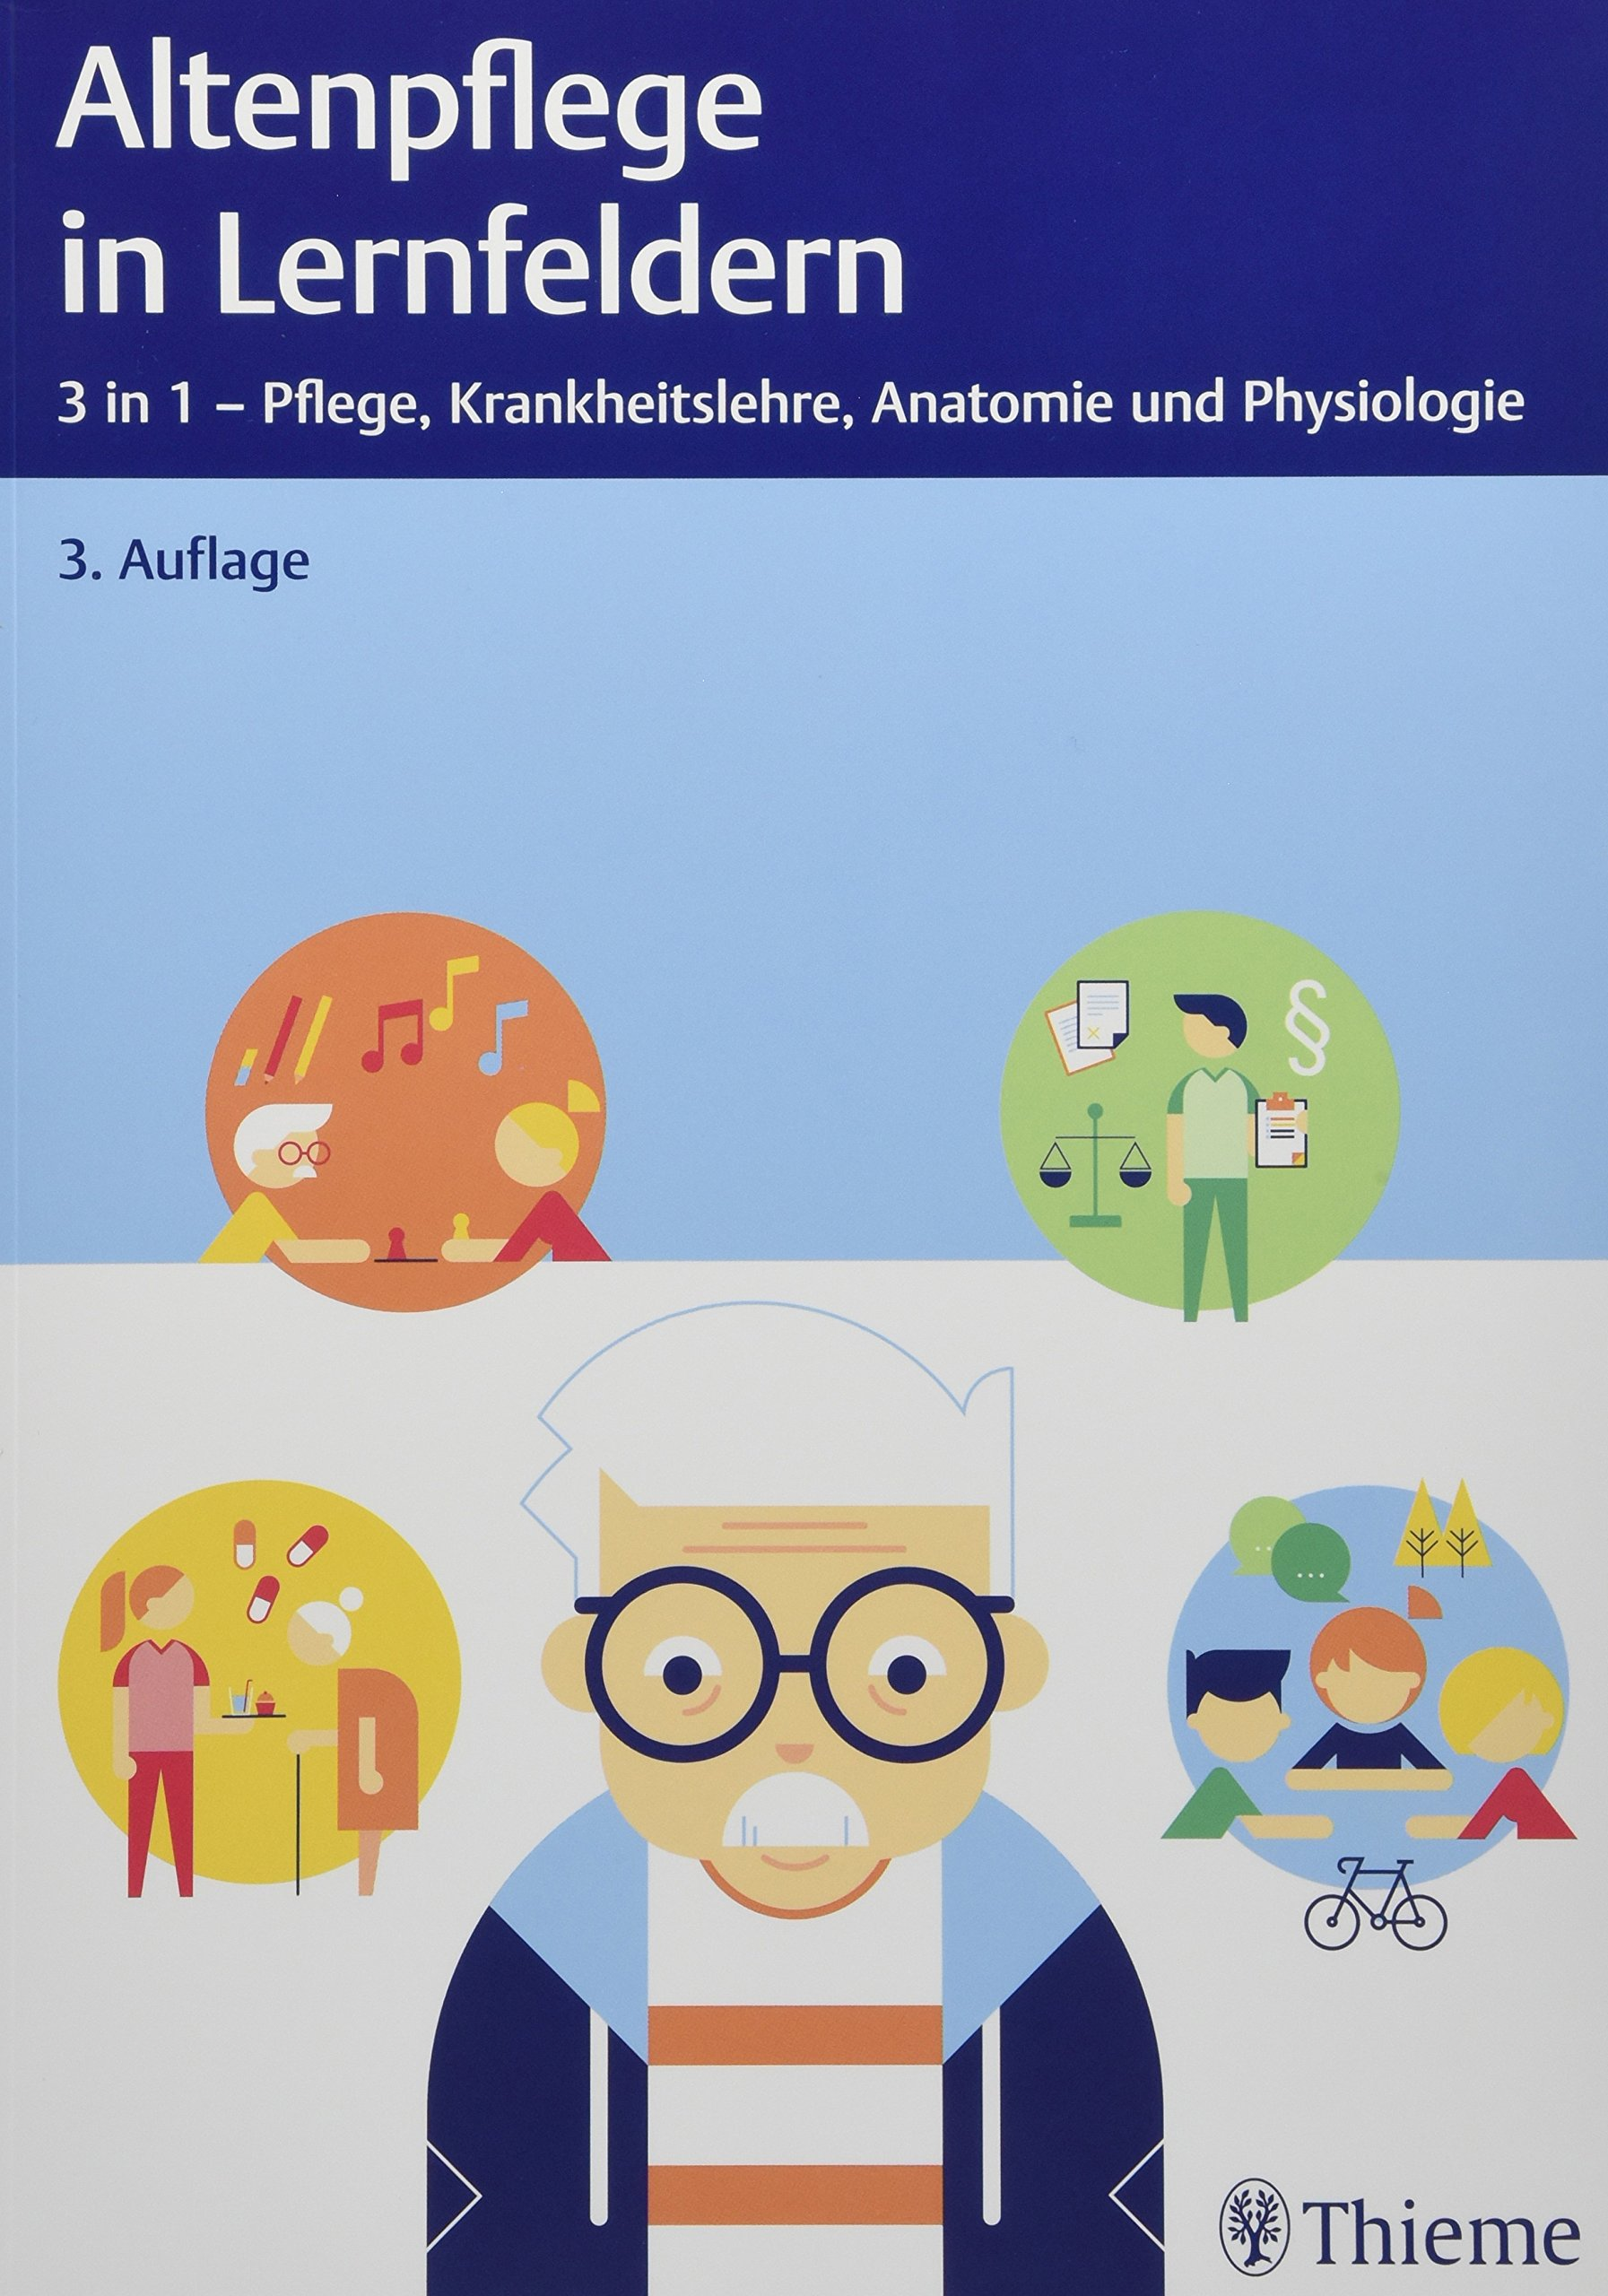 Altenpflege in Lernfeldern: 3 in 1 - Pflege, Krankheitslehre ...